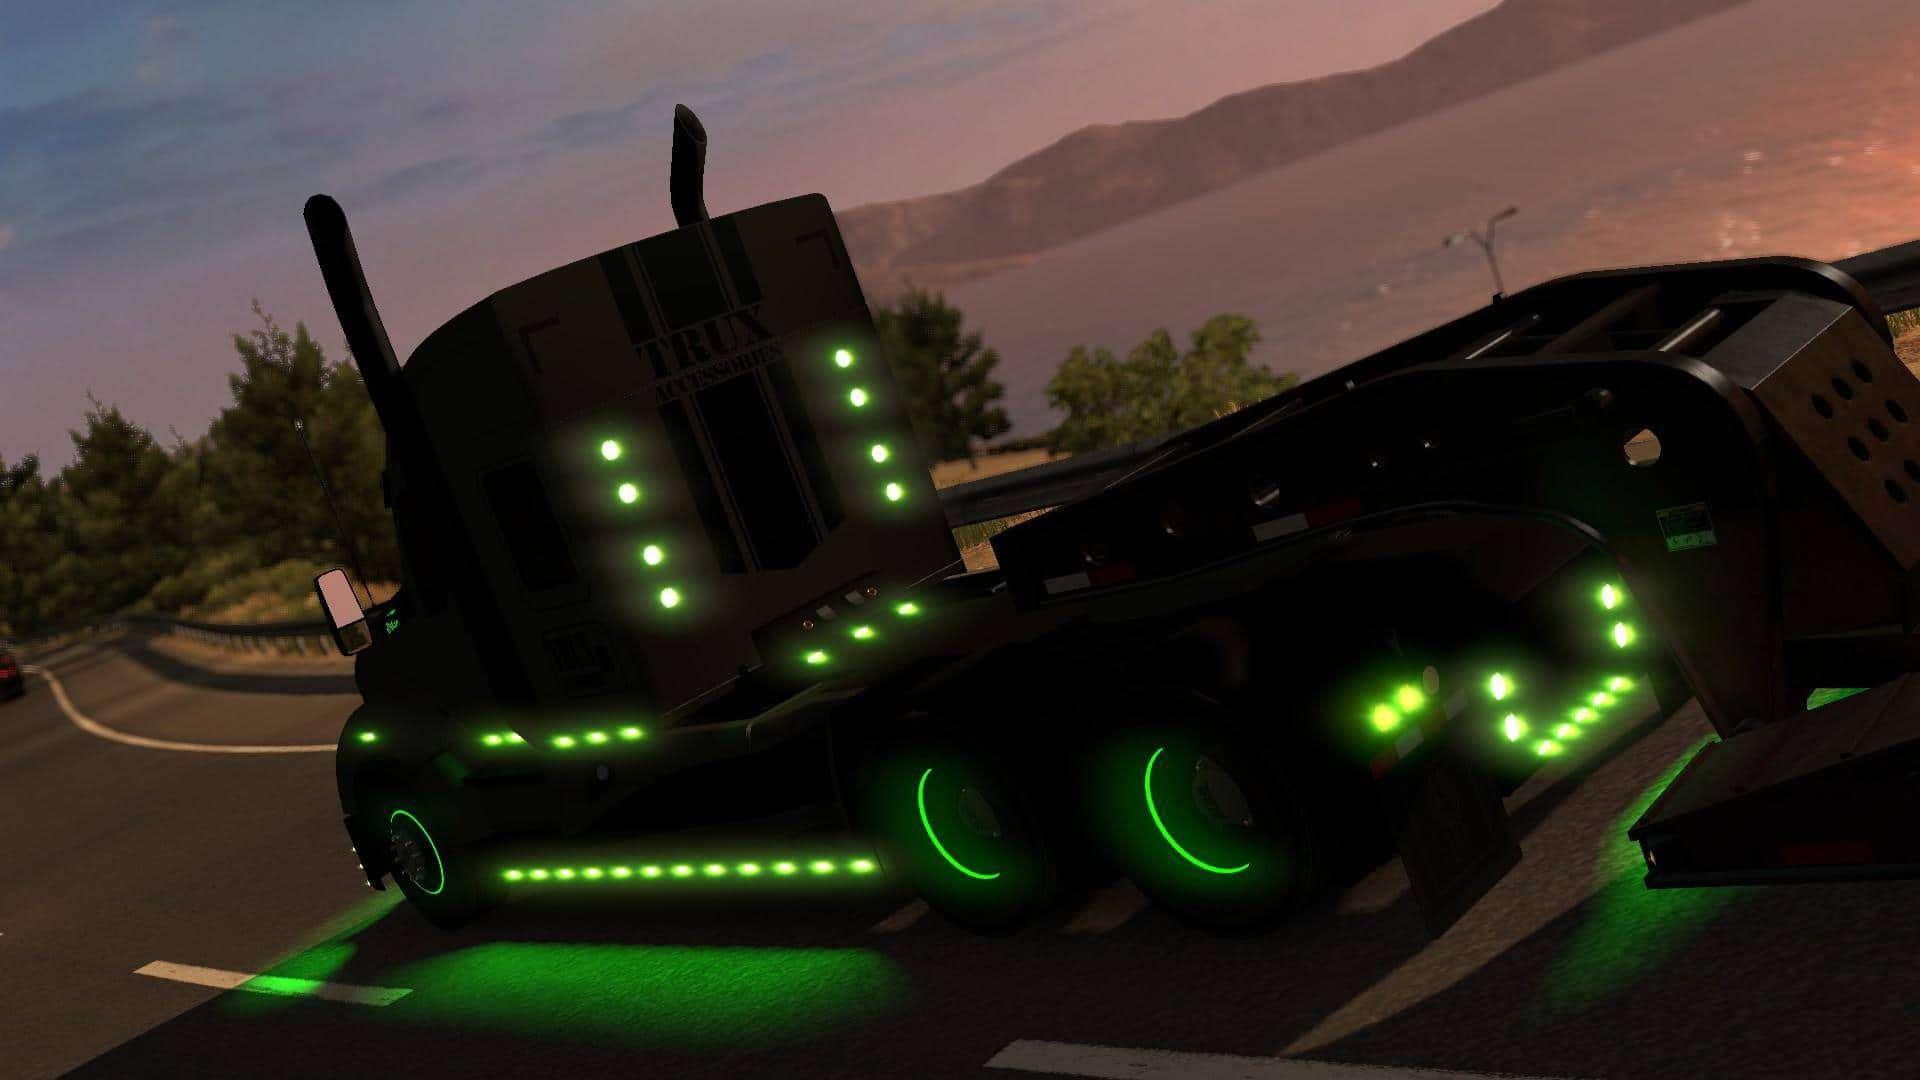 Kenworth T680 For Sale >> Kenworth T680 The General 1.33.x - American Truck Simulator mod | ATS mod